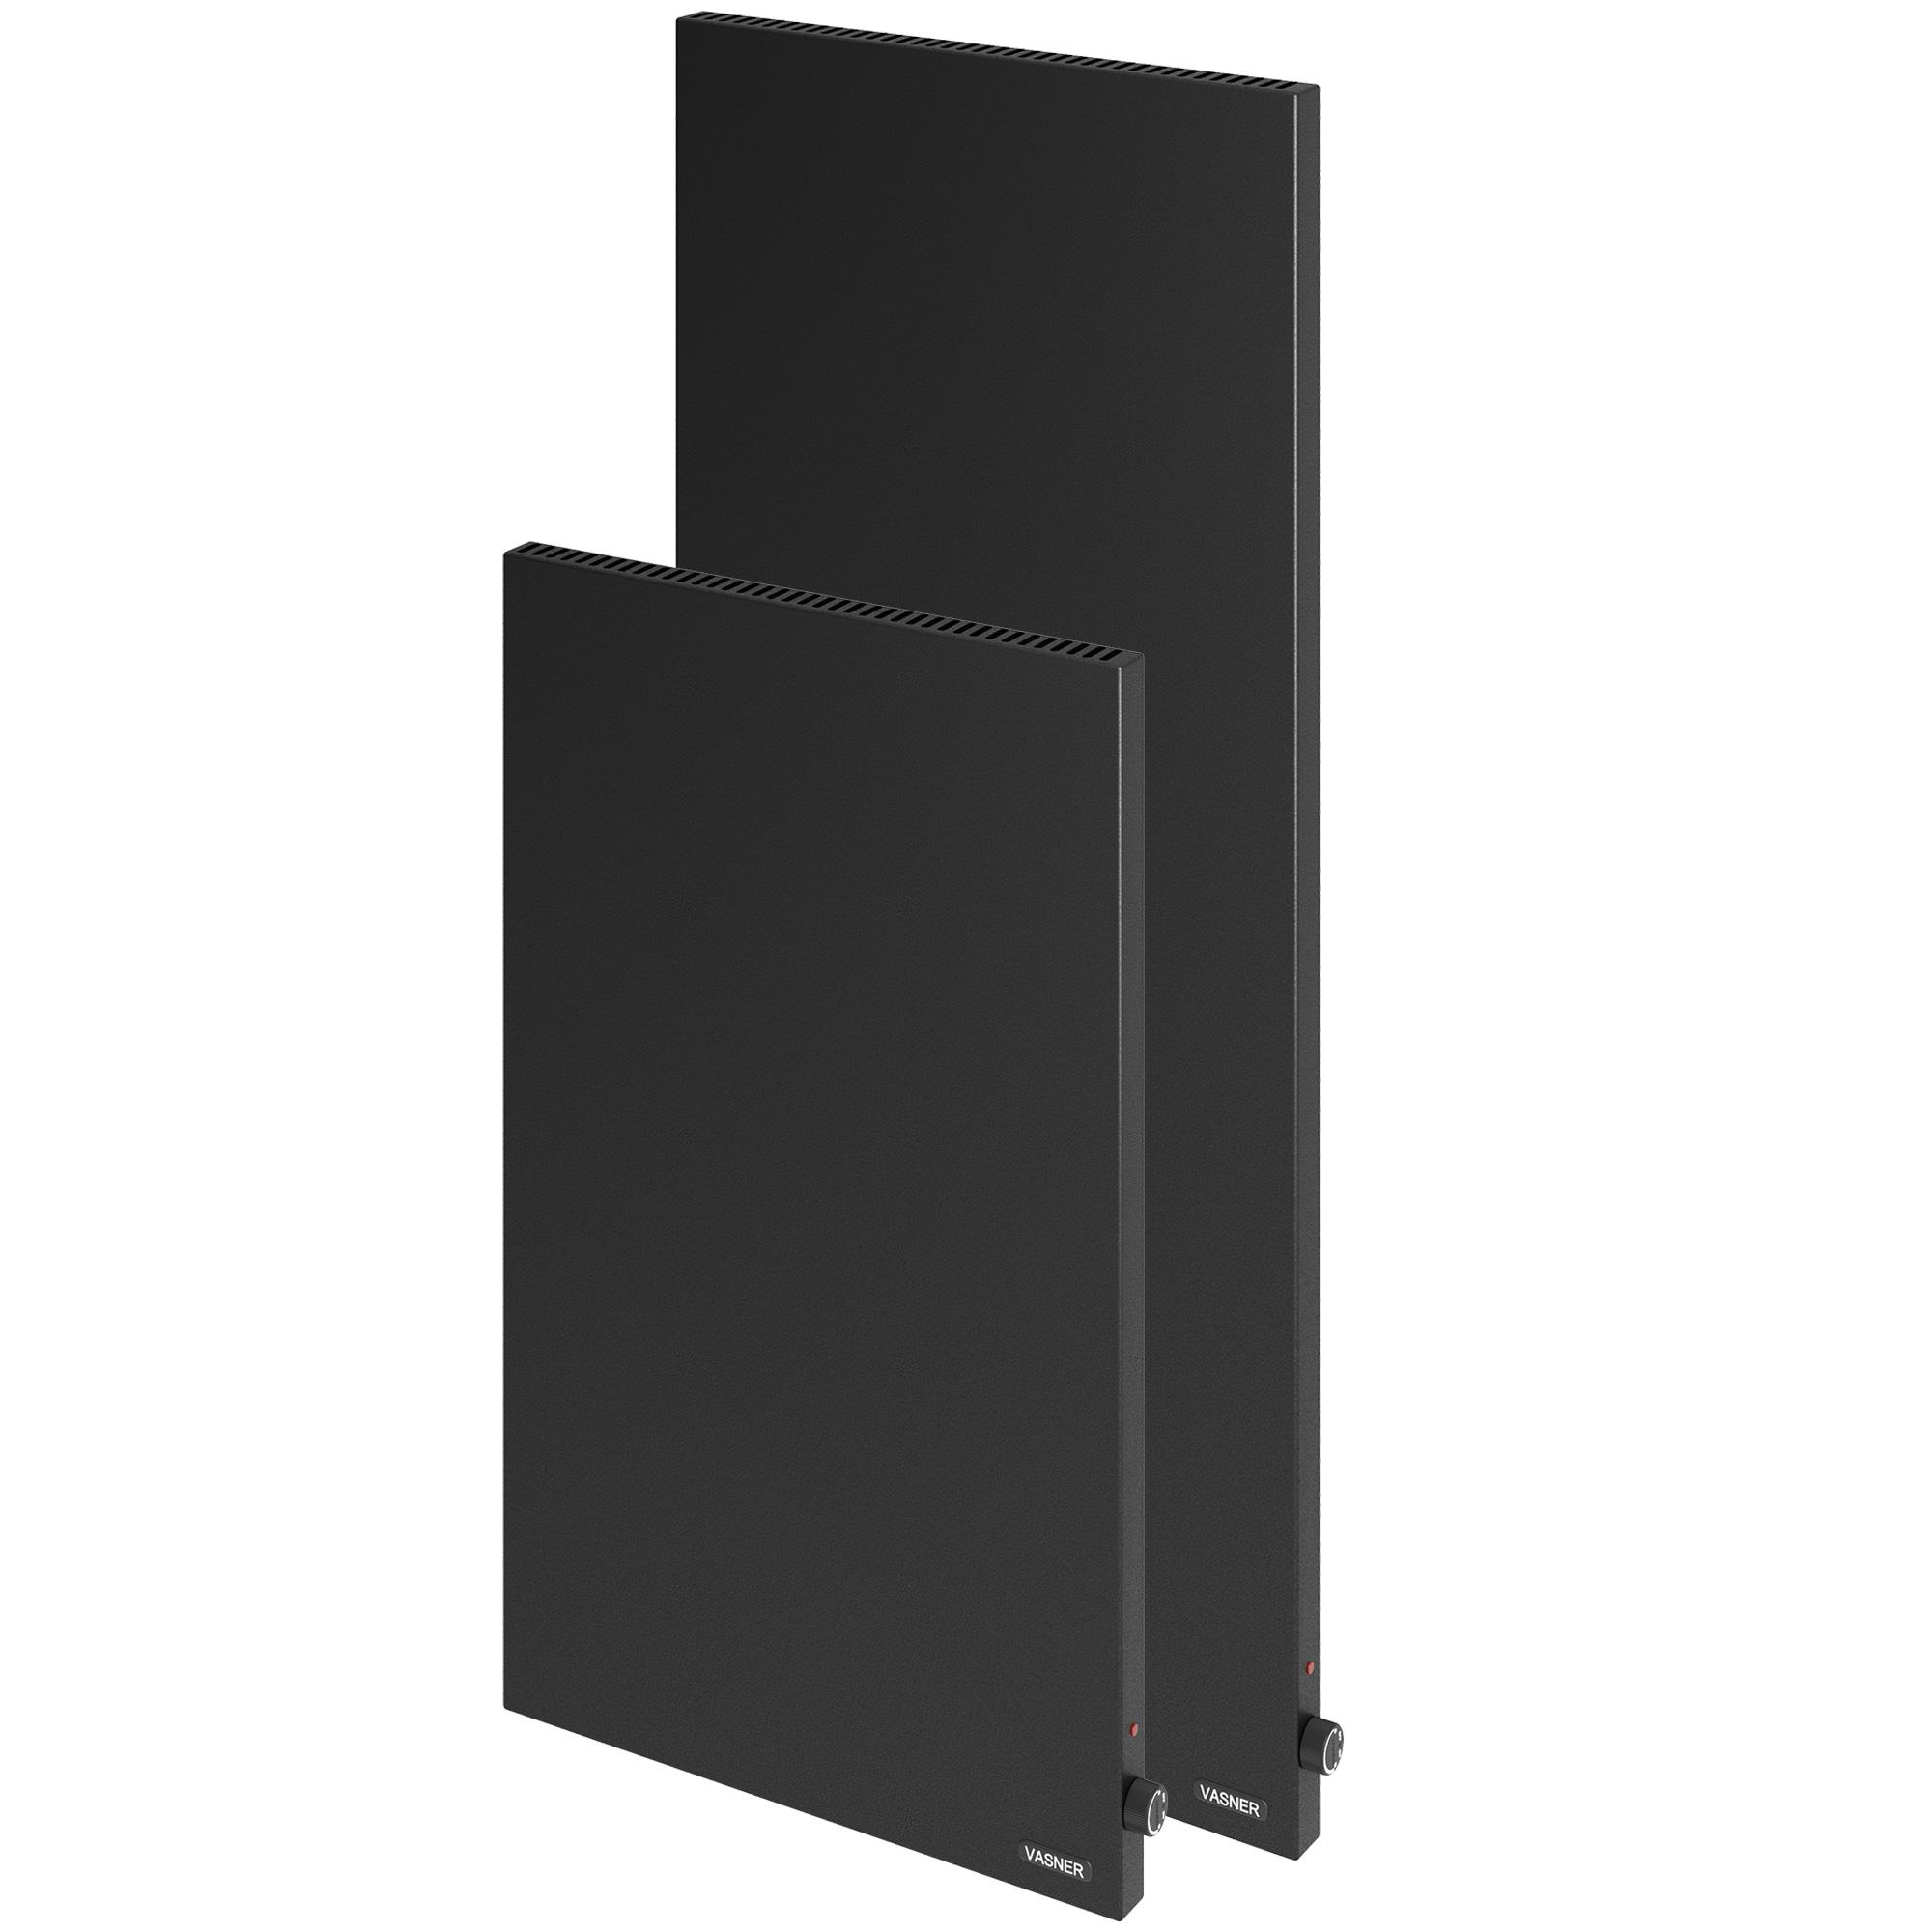 VASNER Konvi VE Schwarz vertikale Hybrid Infrarotheizung mit Thermostat